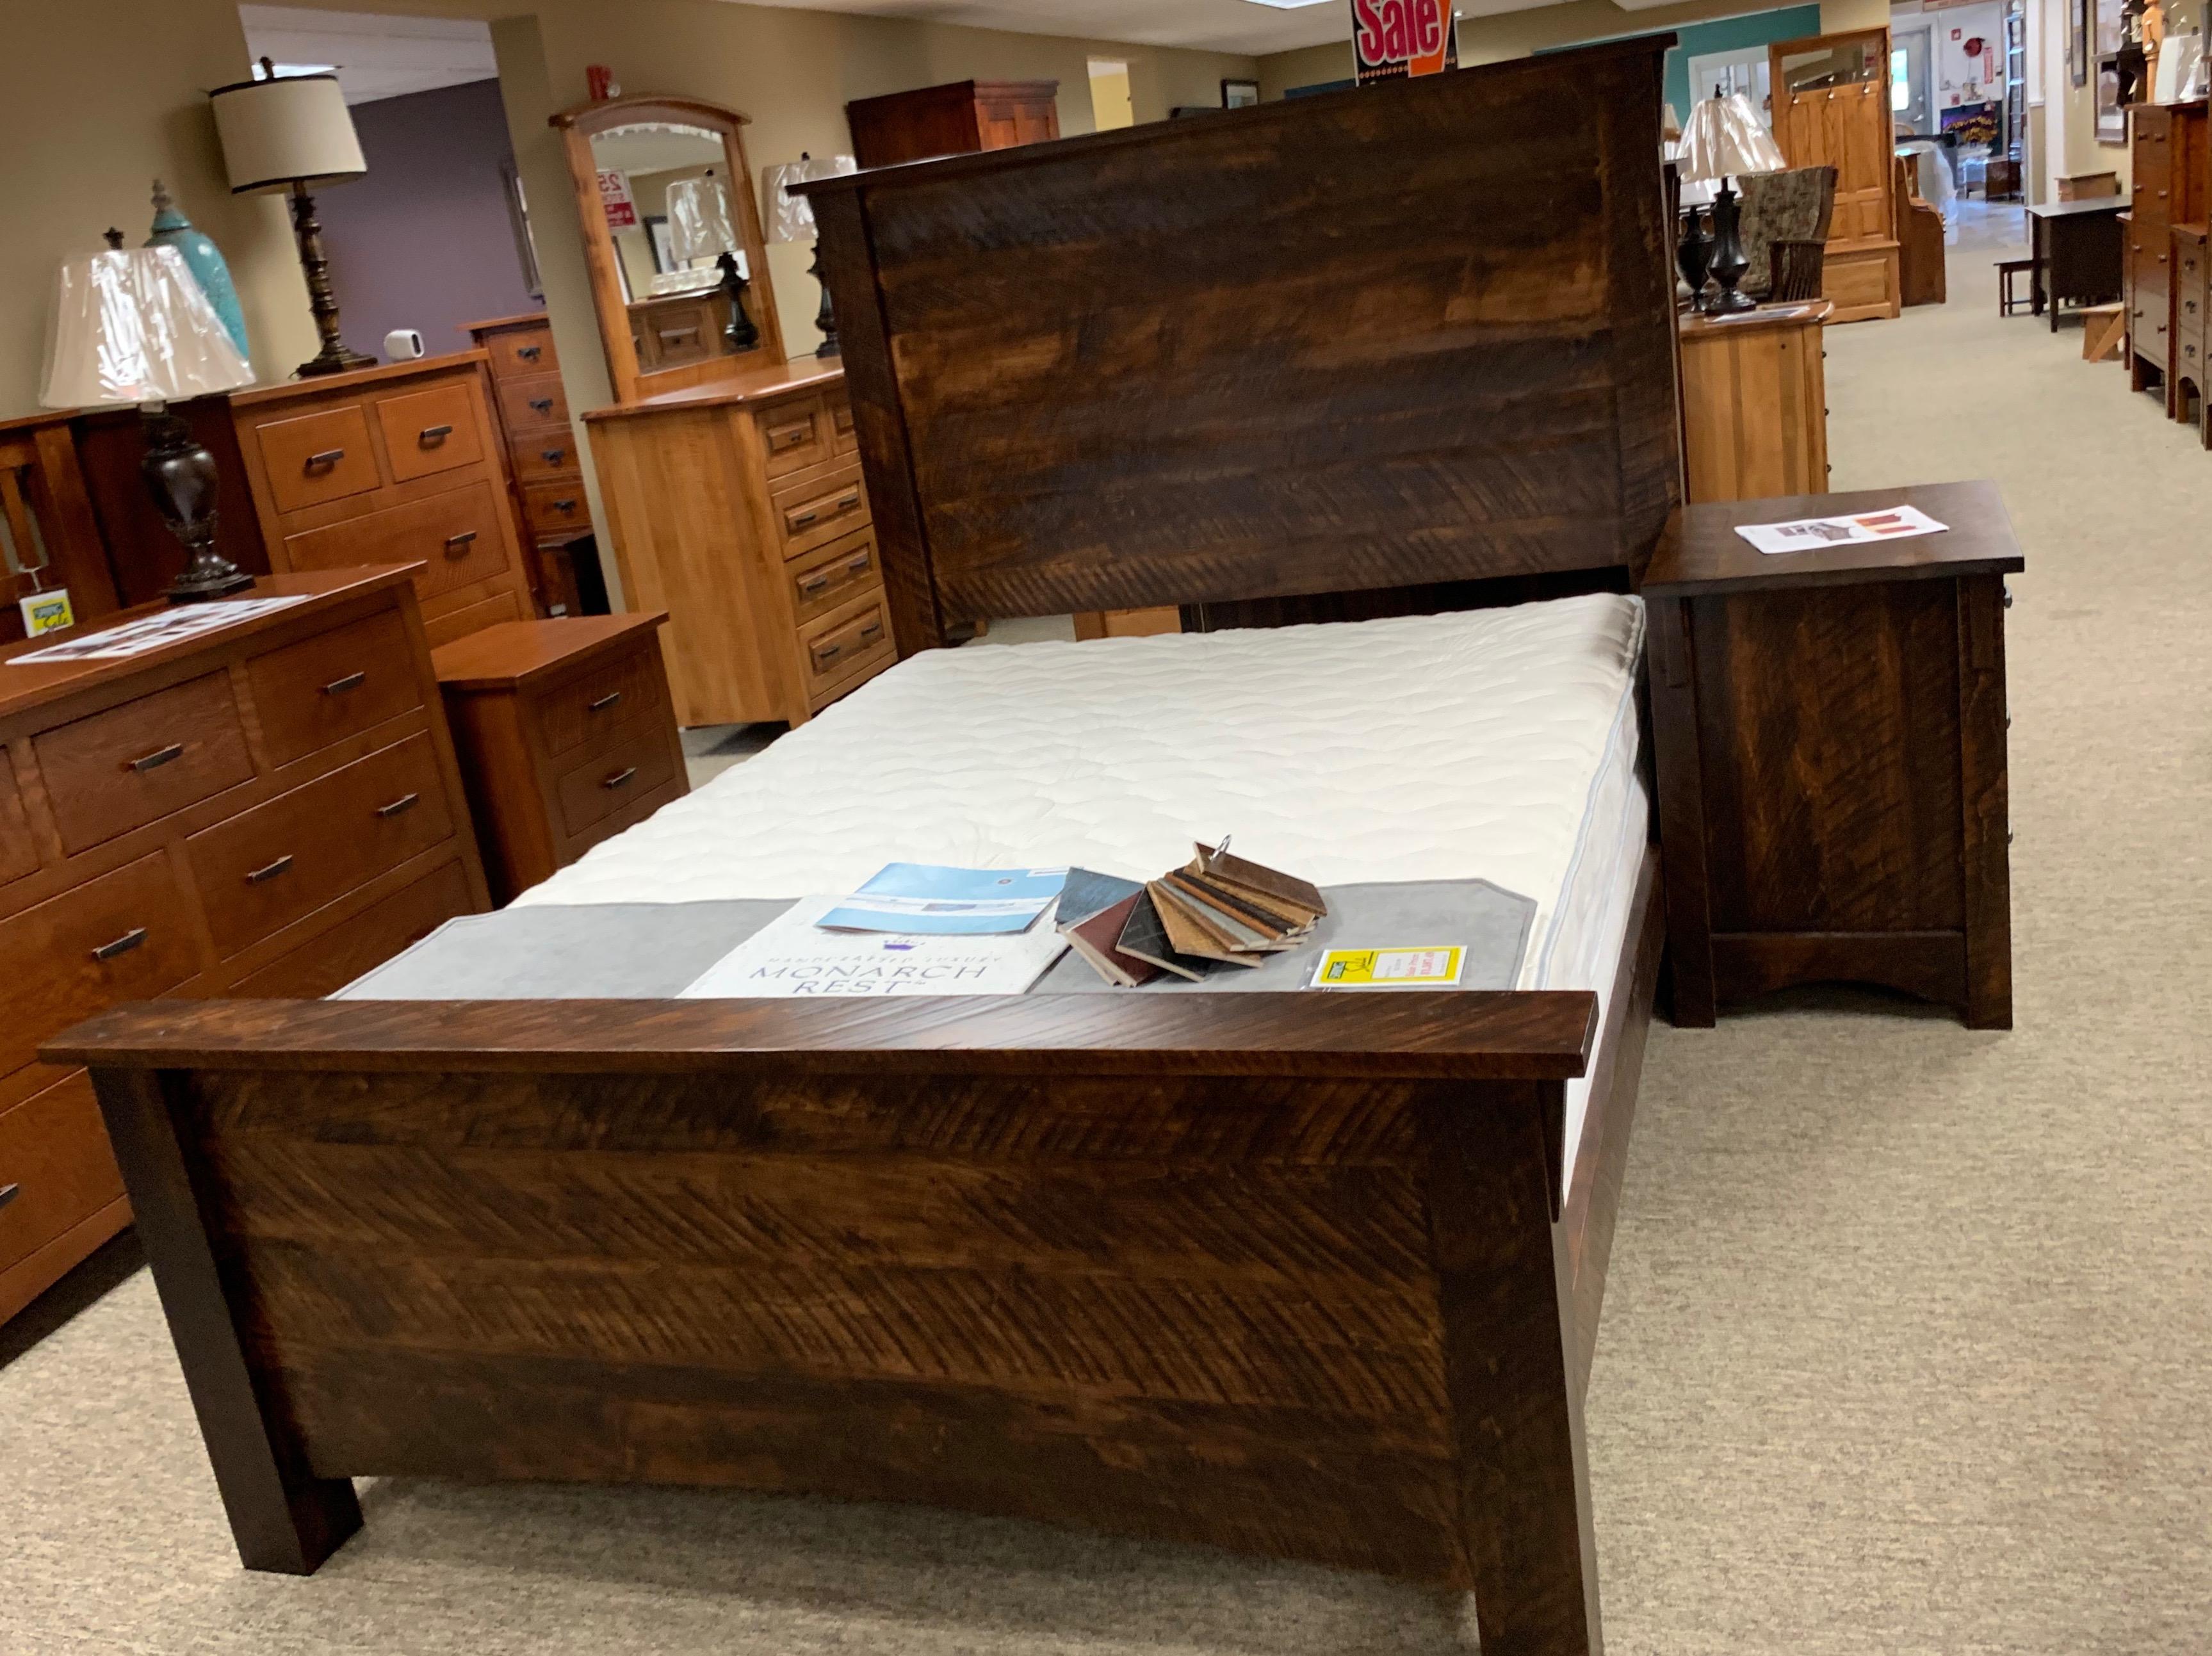 Maplewood Bed